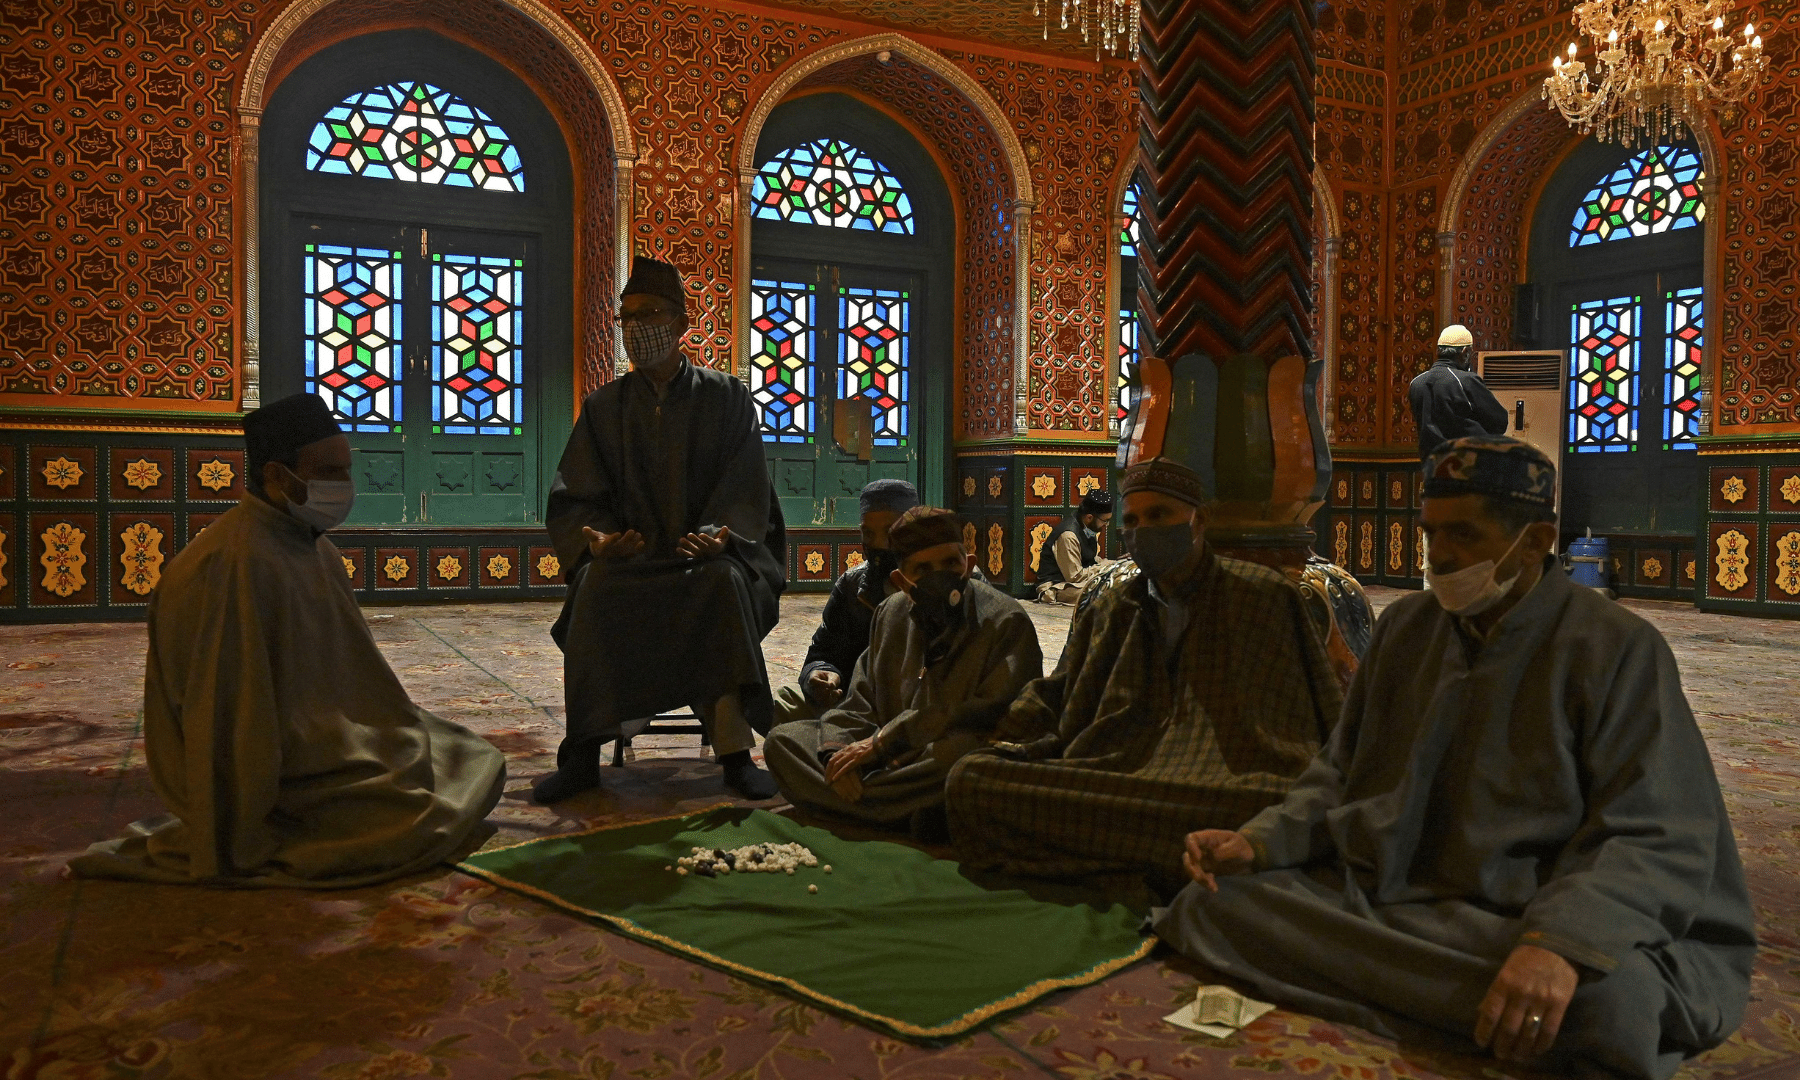 Muslim devotees pray at a shrine during Ramazan in Srinagar on Thursday. — AFP